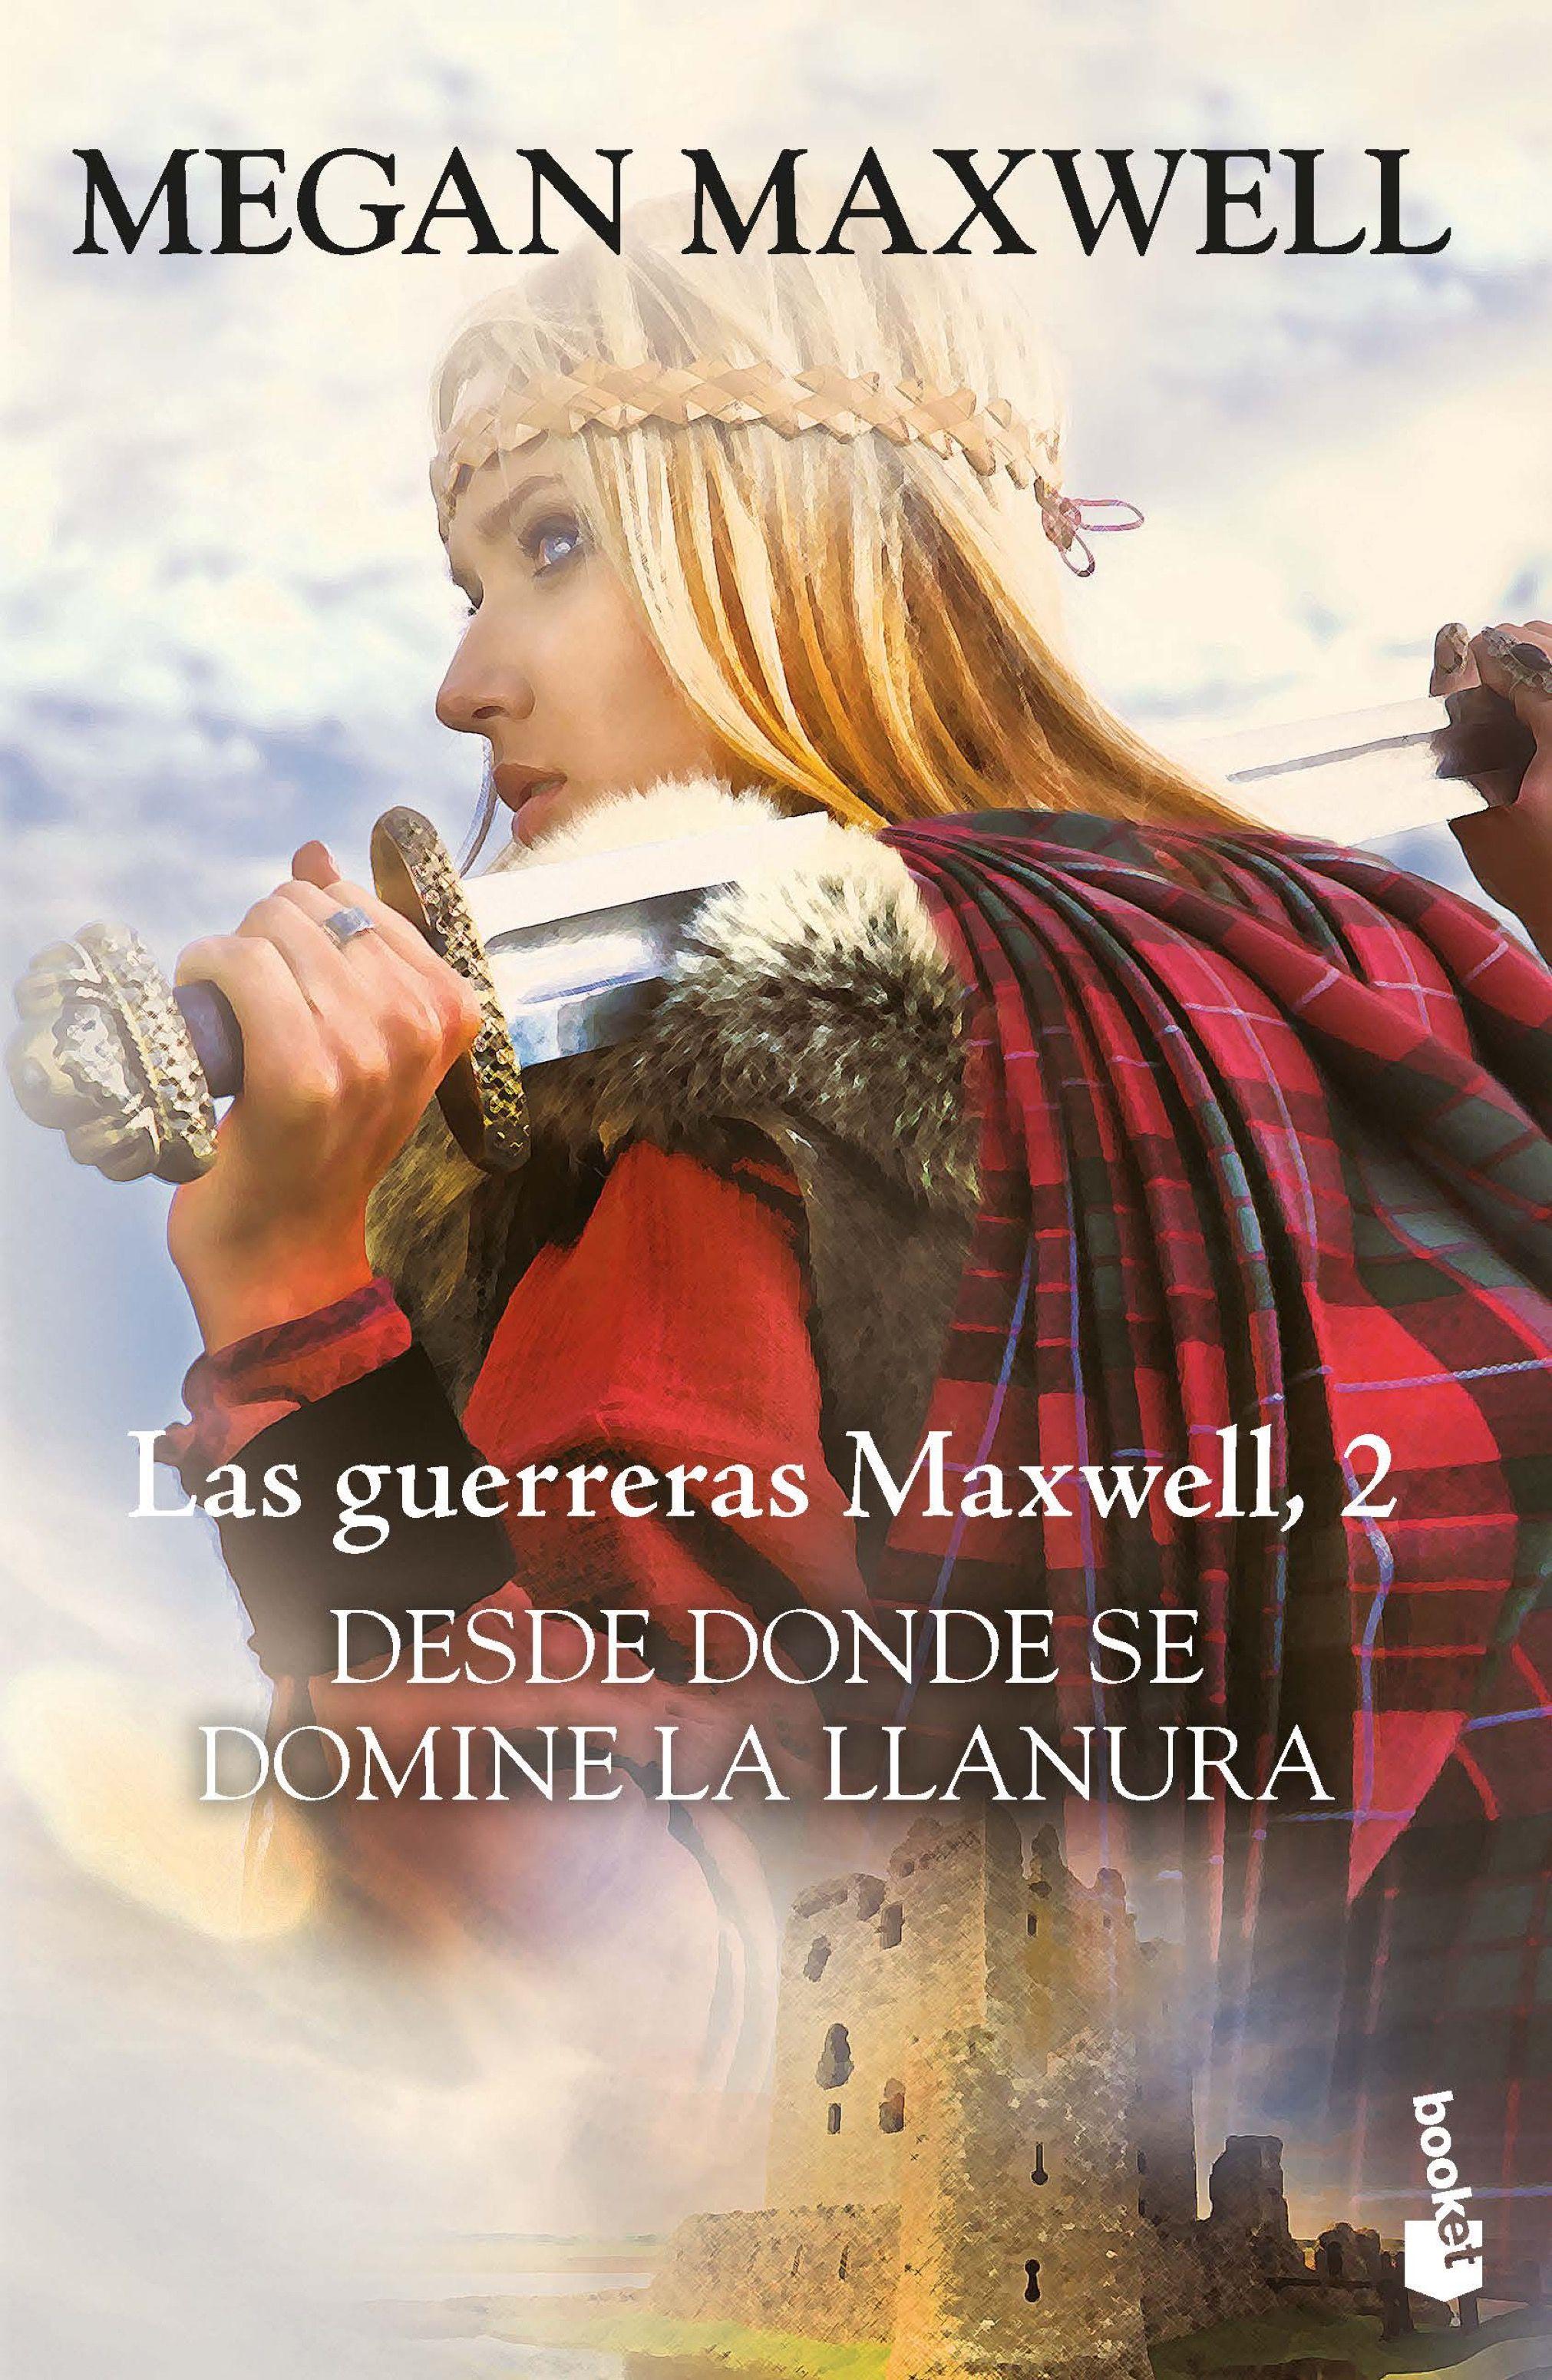 Desde Donde se Domine la Llanura - Megan Maxwell - Booket